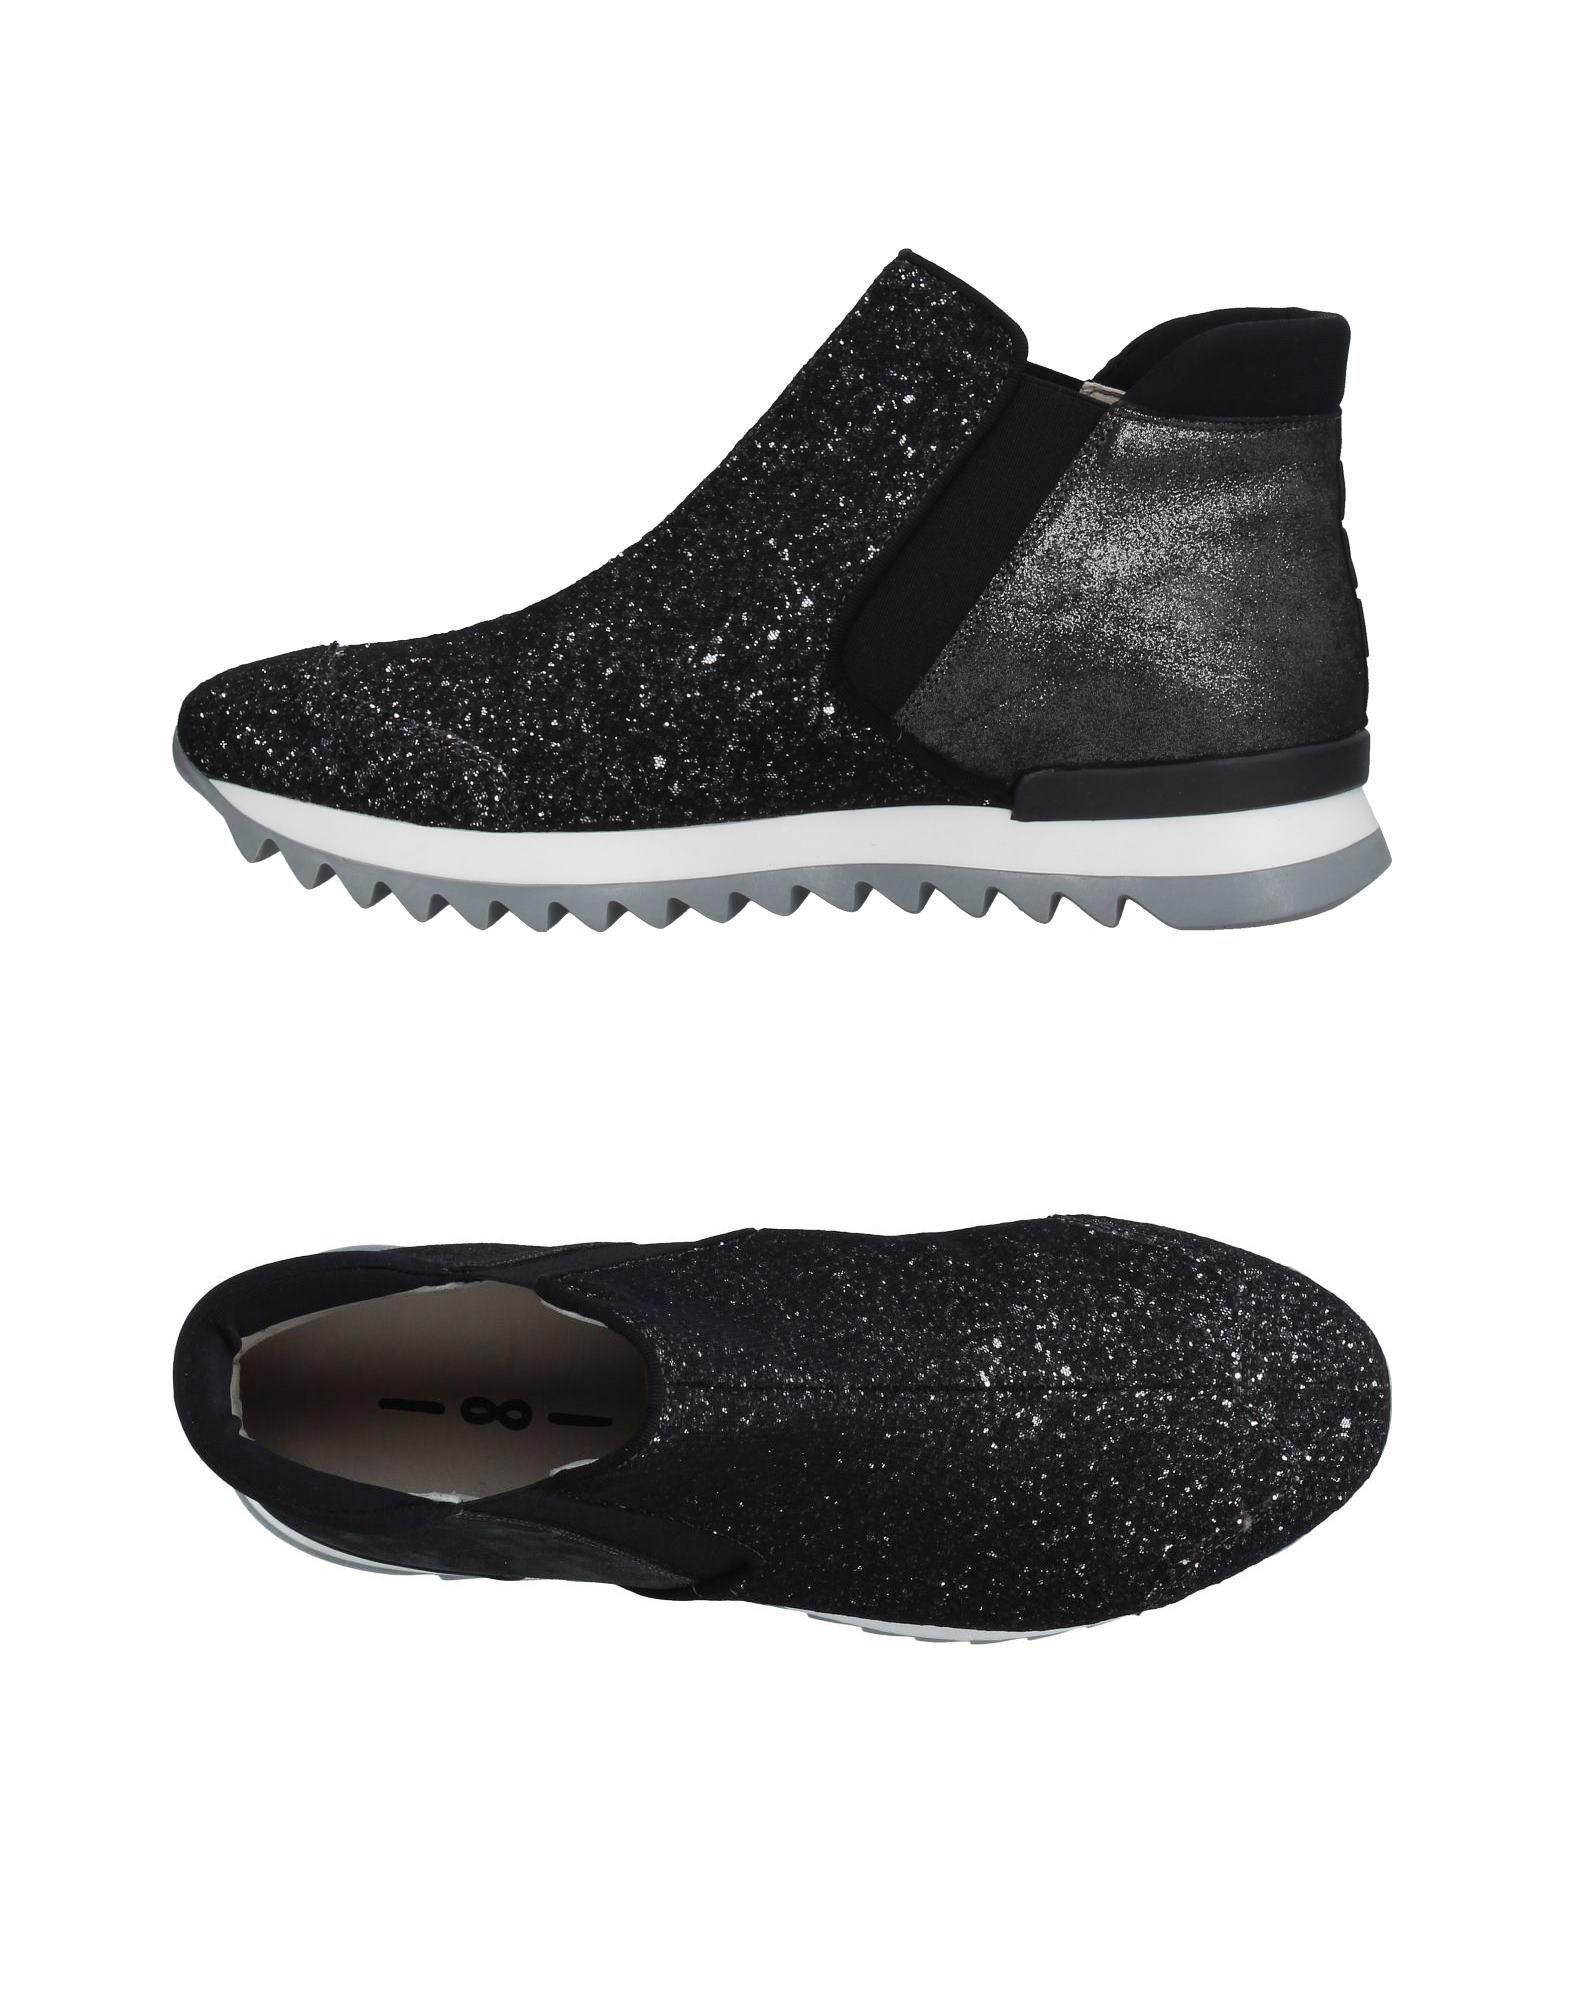 181 By Alberto Gozzi Sneakers Sneakers Sneakers - Women 181 By Alberto Gozzi Sneakers online on  United Kingdom - 11233261MJ bd22dc